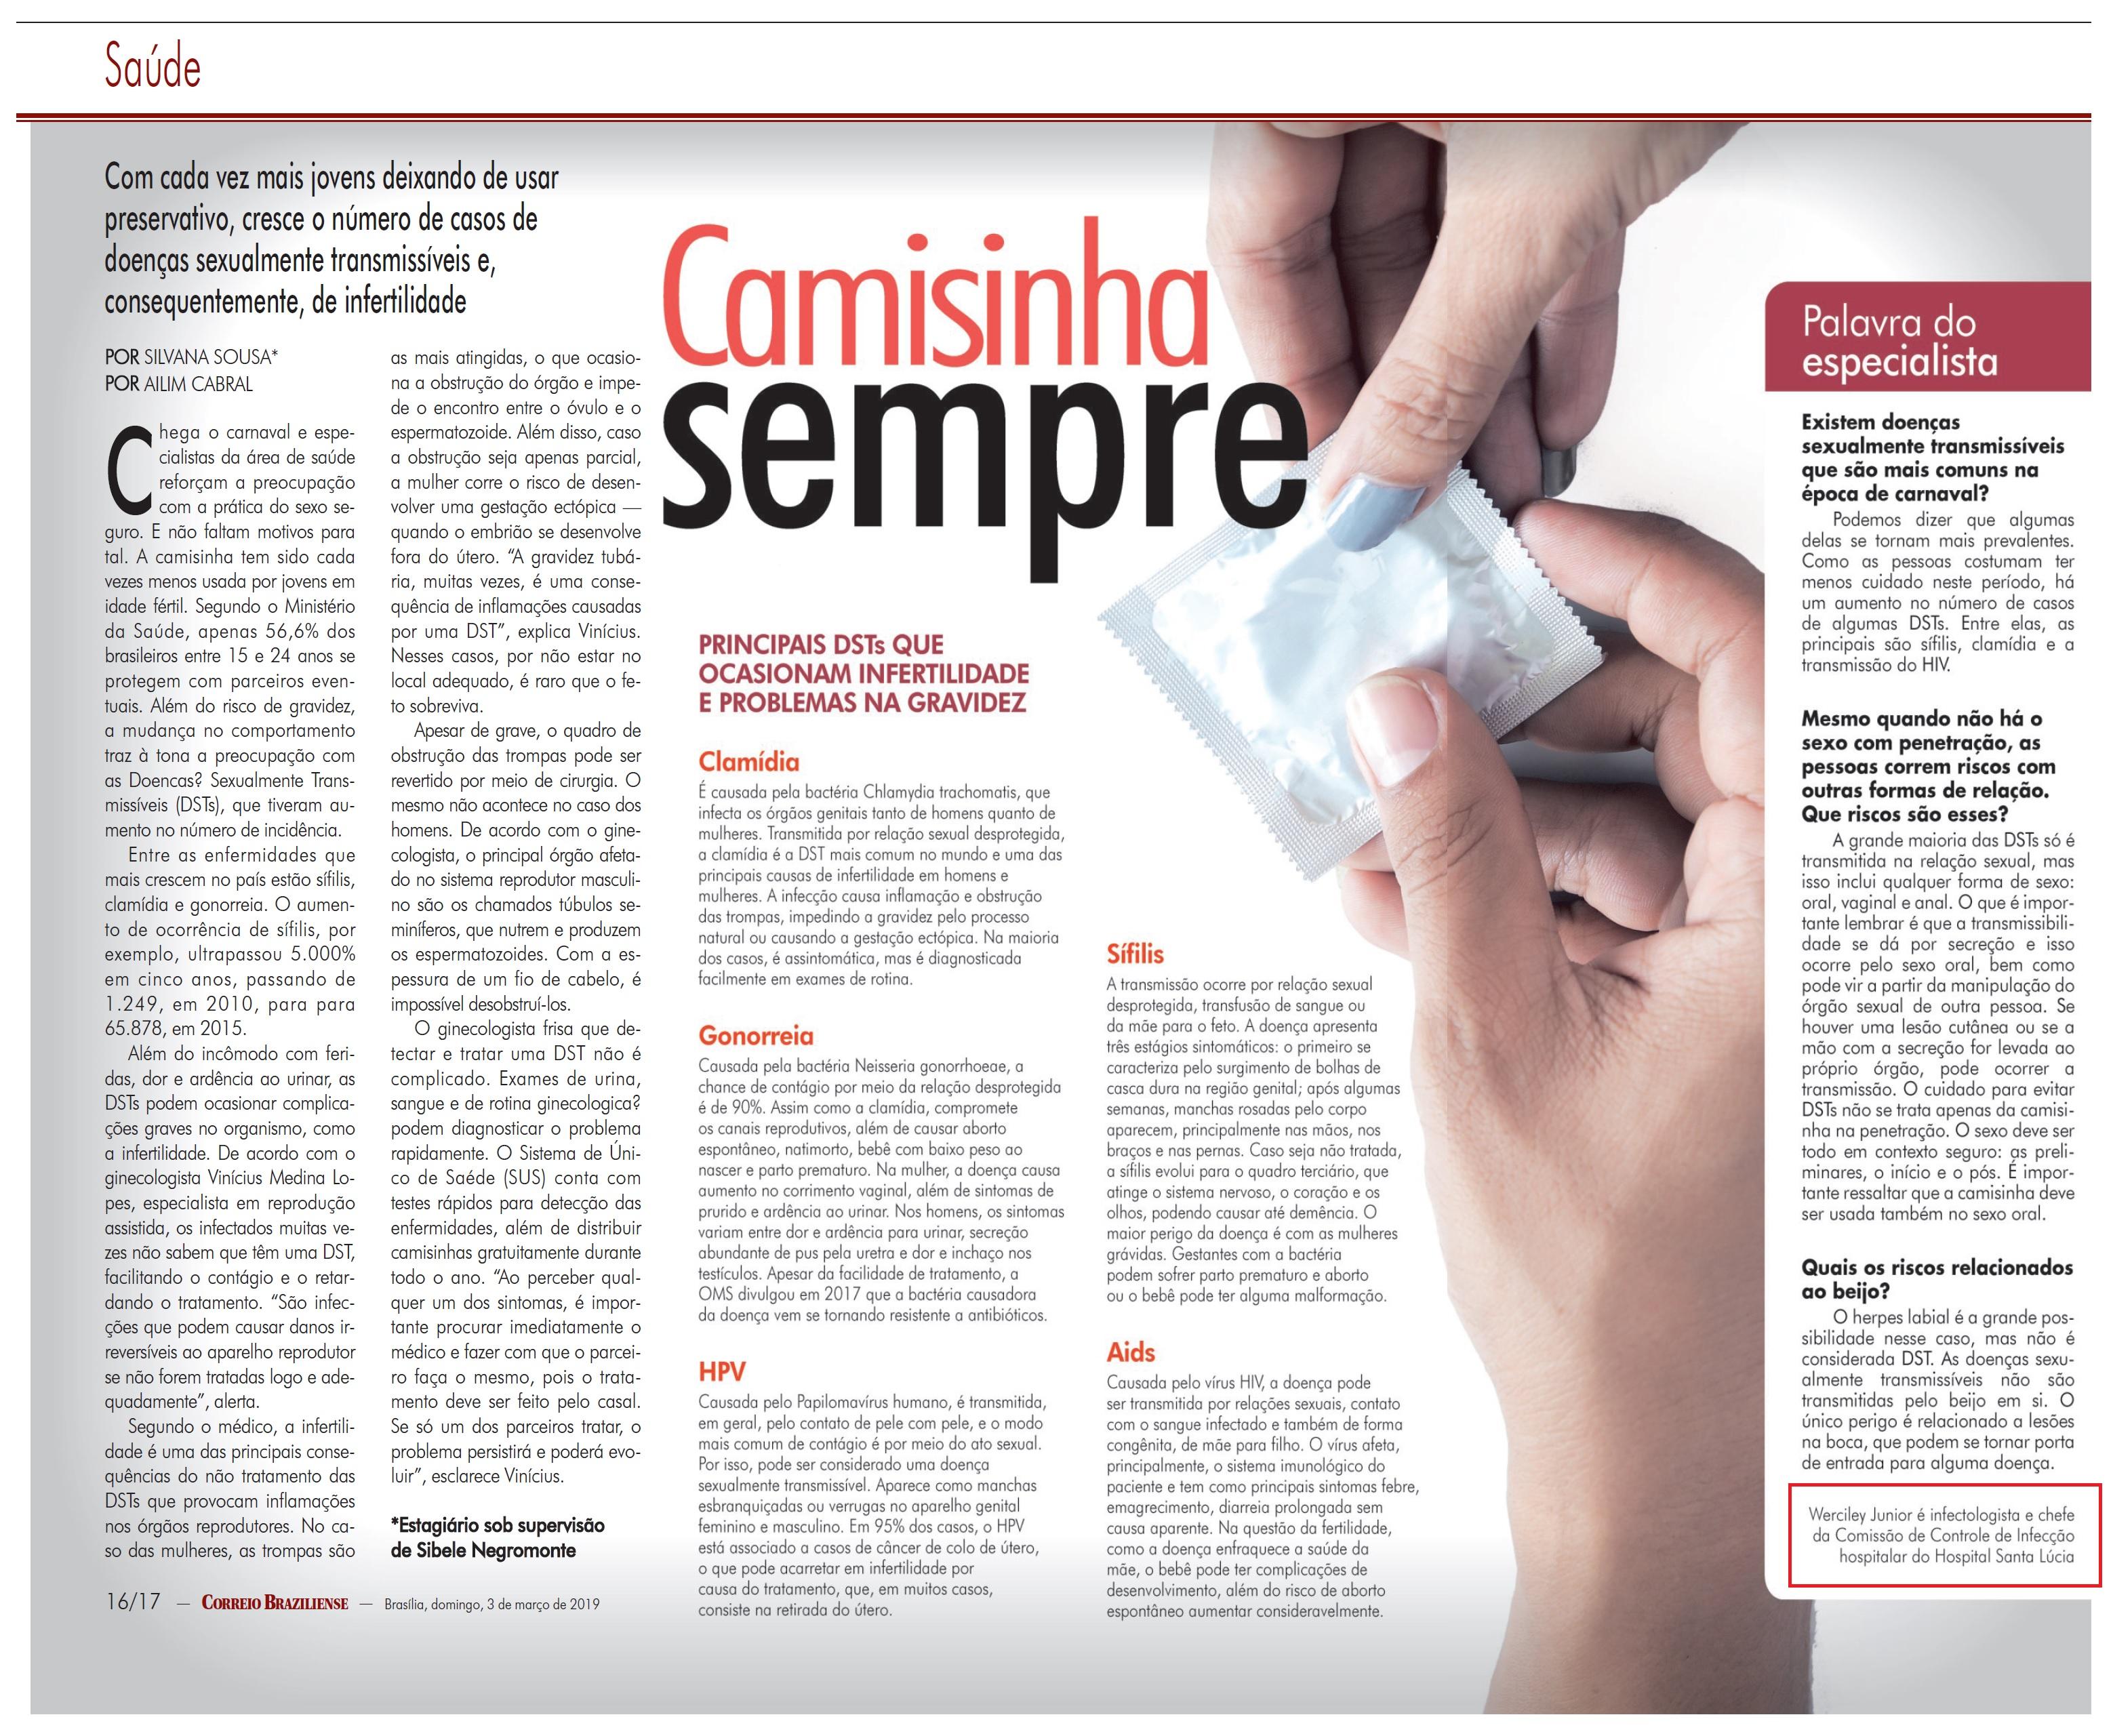 Revista do Correio - Dr. Werciley Júnior HSLS - 03-03-2019